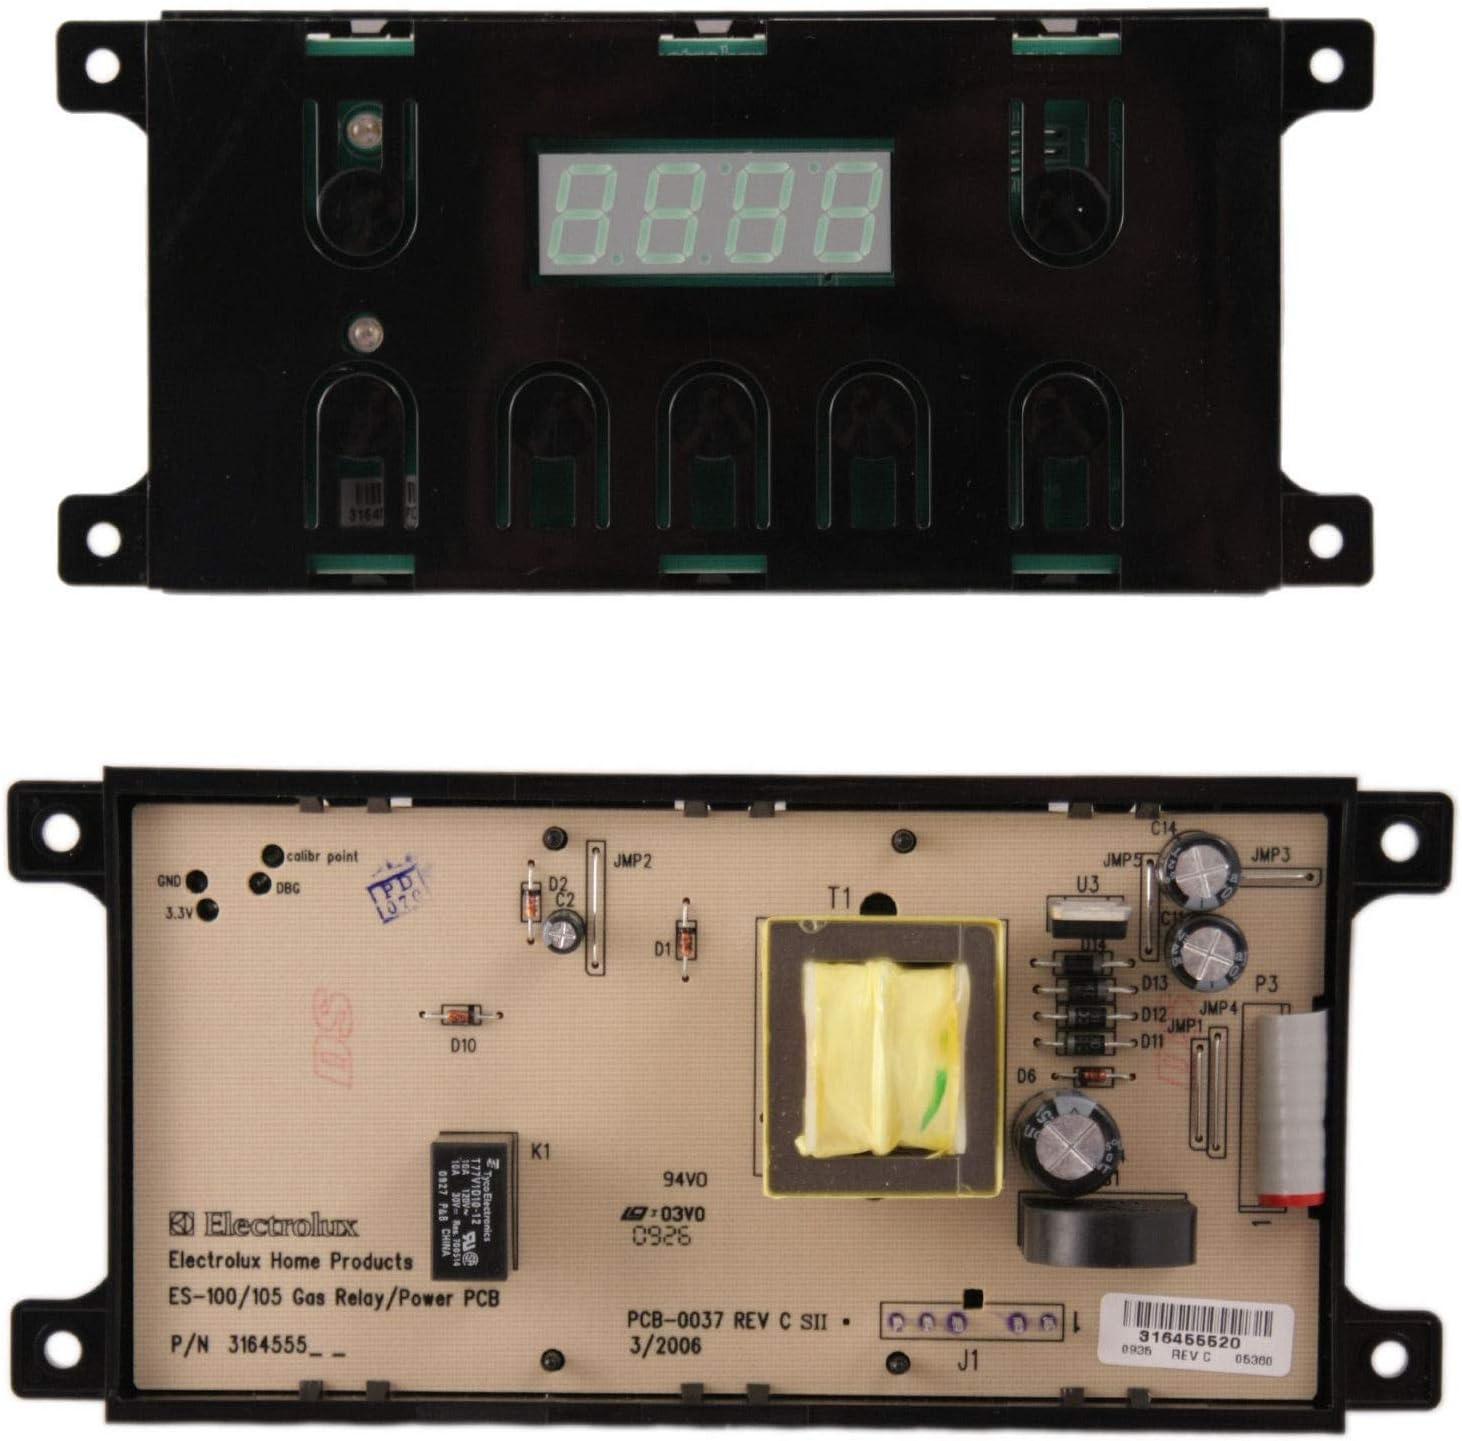 316455410 Oven Control Board Fits Frigidaire Gas Range 316455430